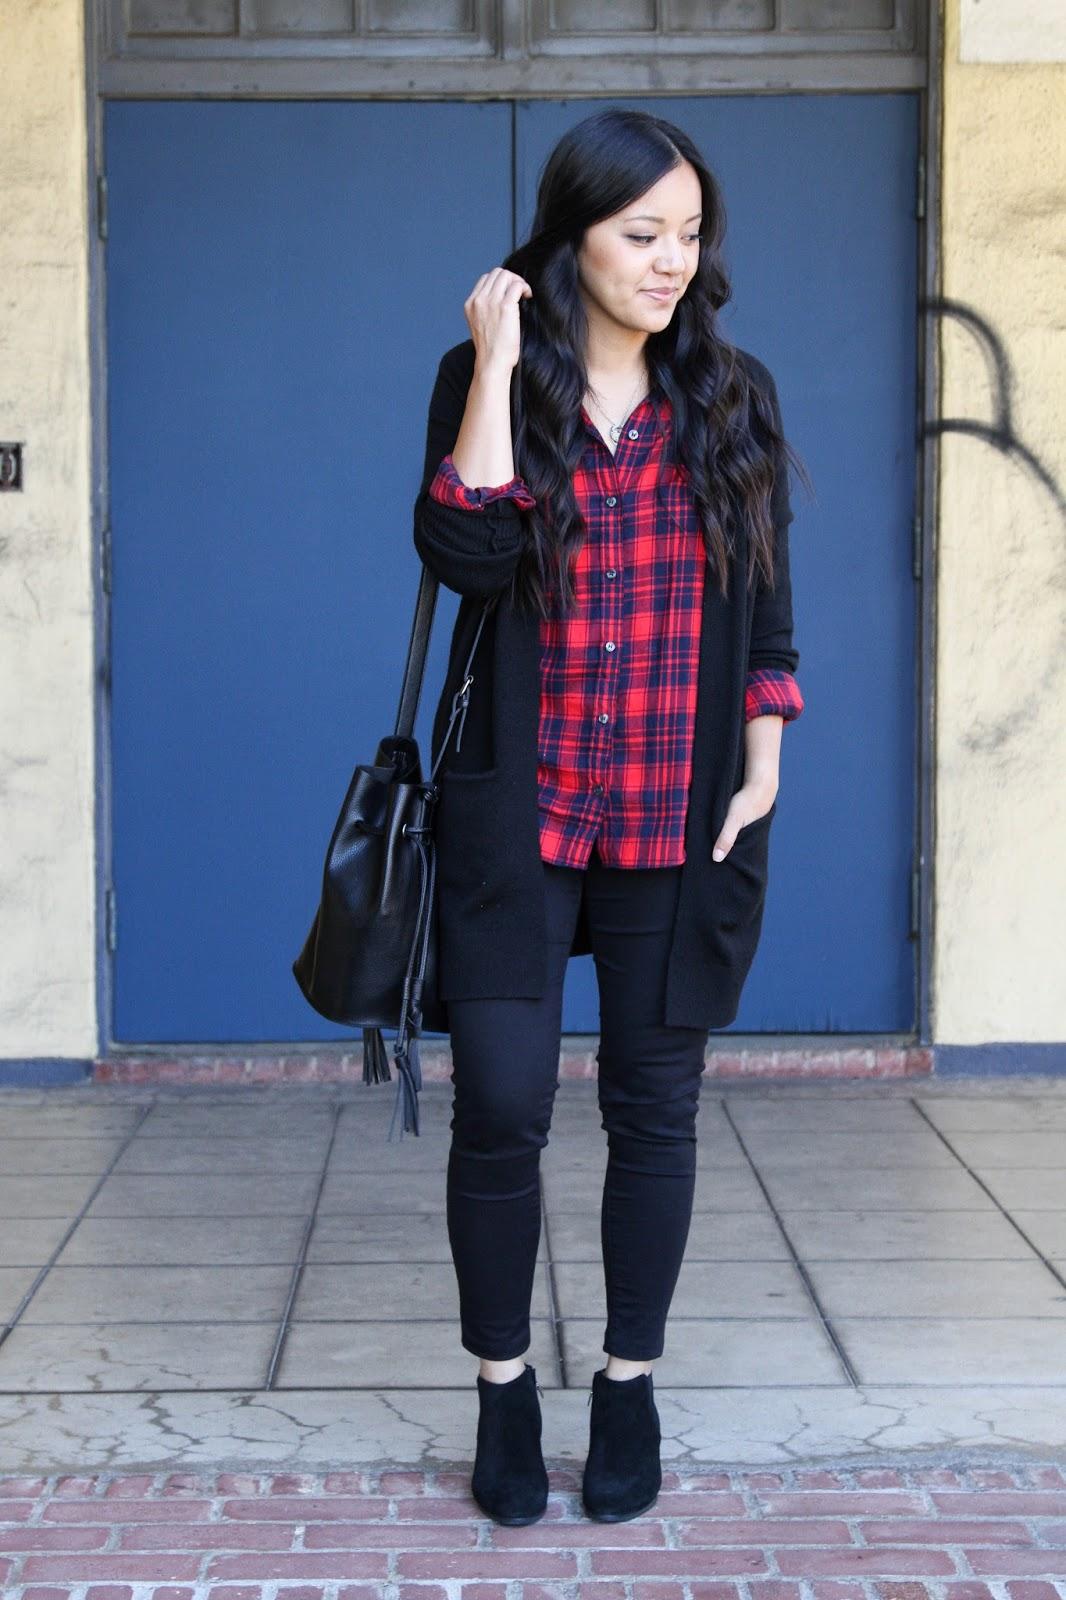 Black Cardigan + Plaid Shirt + Black Skinnies + Bucket Bag + Booties